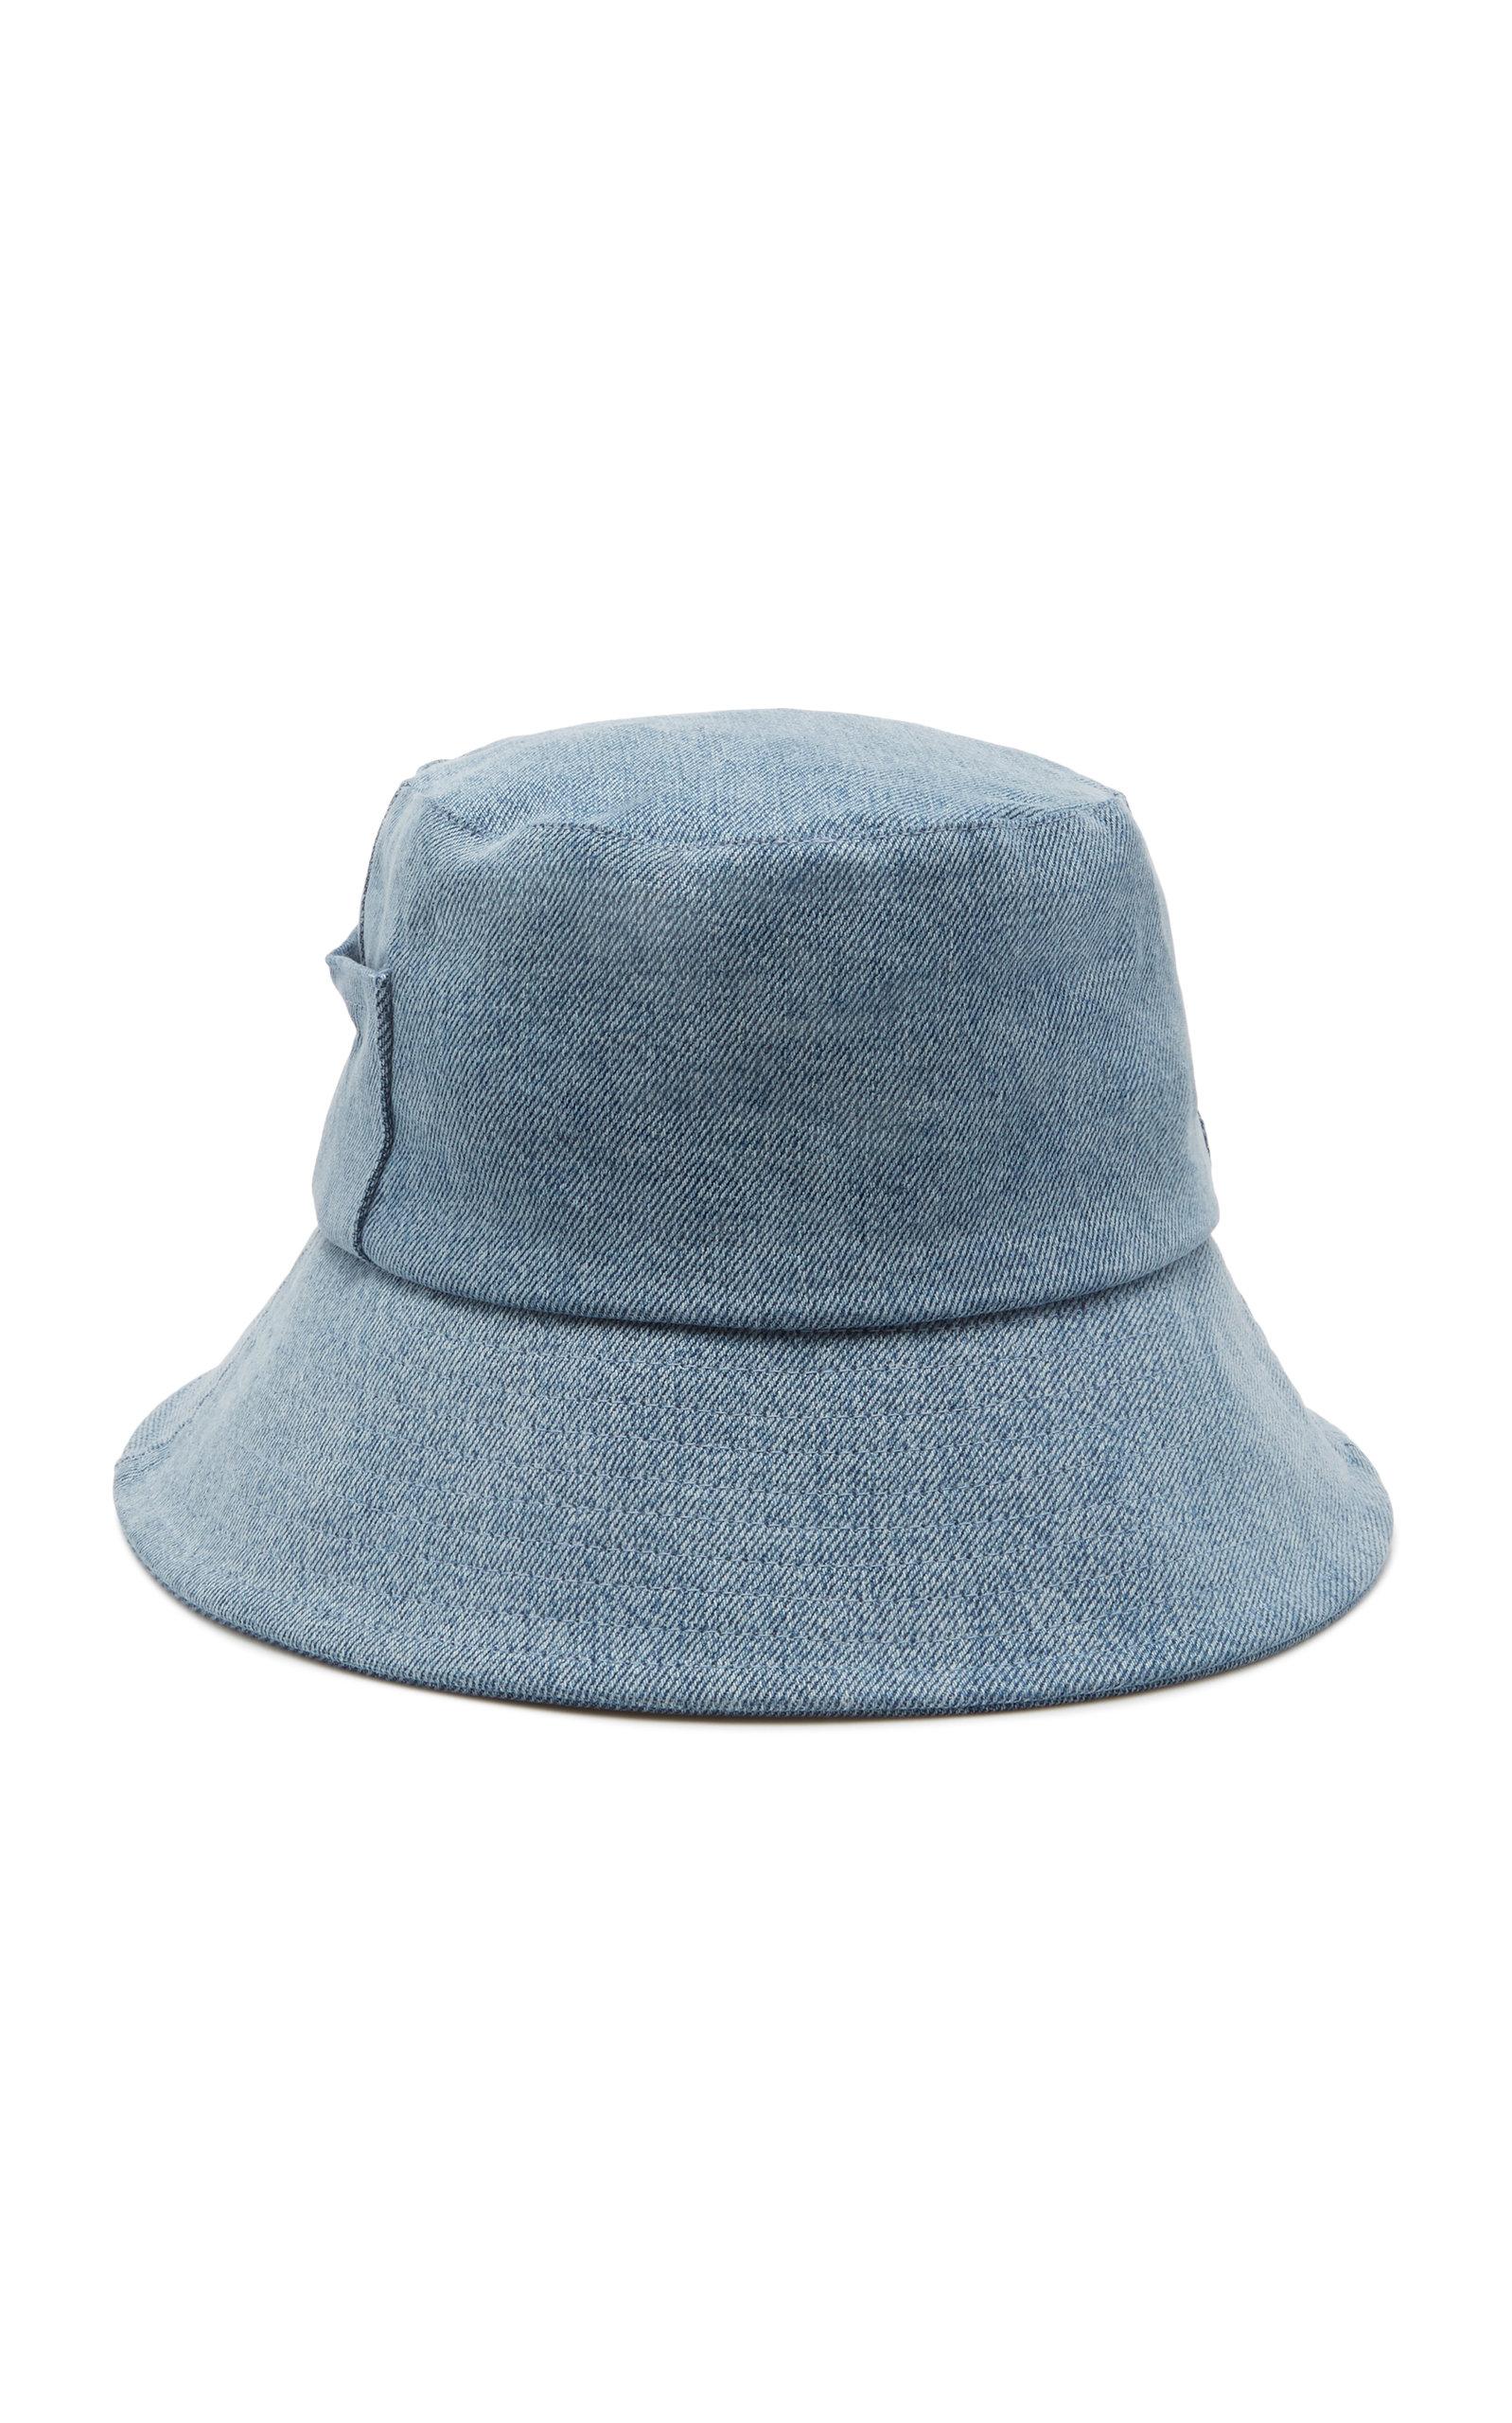 0fdf4b111c5a3 Women's Hats | Moda Operandi